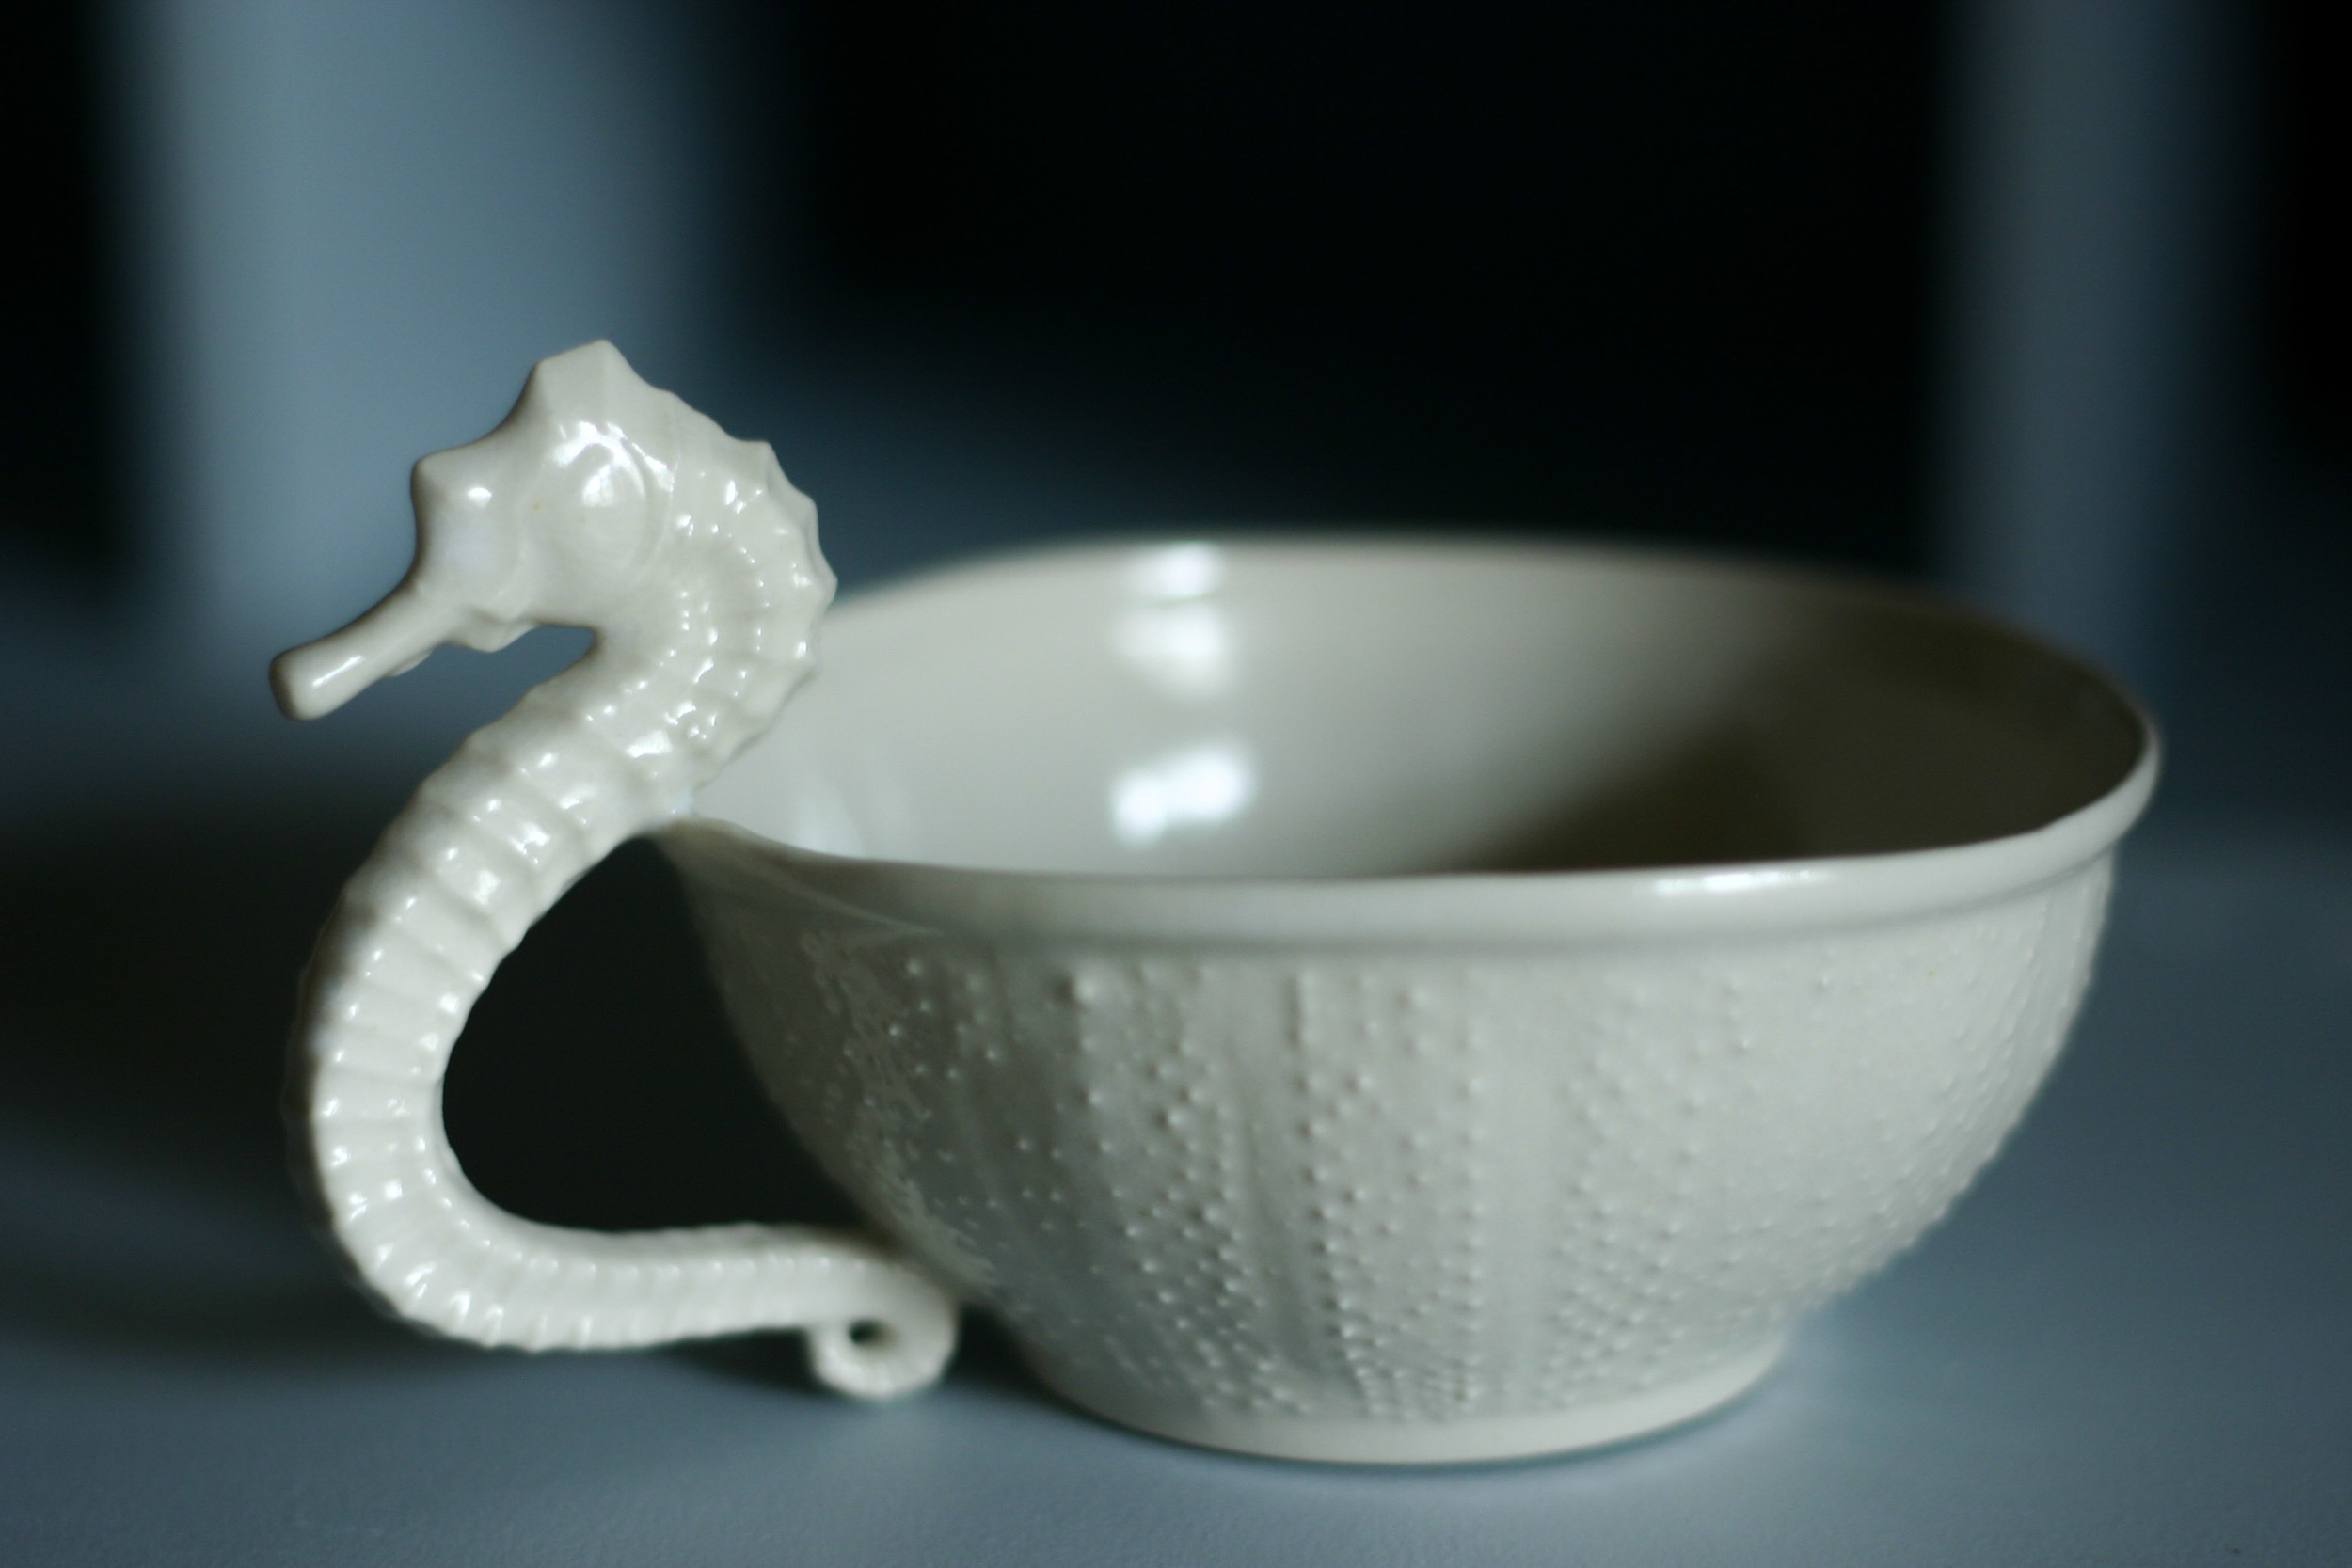 White porcelain teacup  on blue background